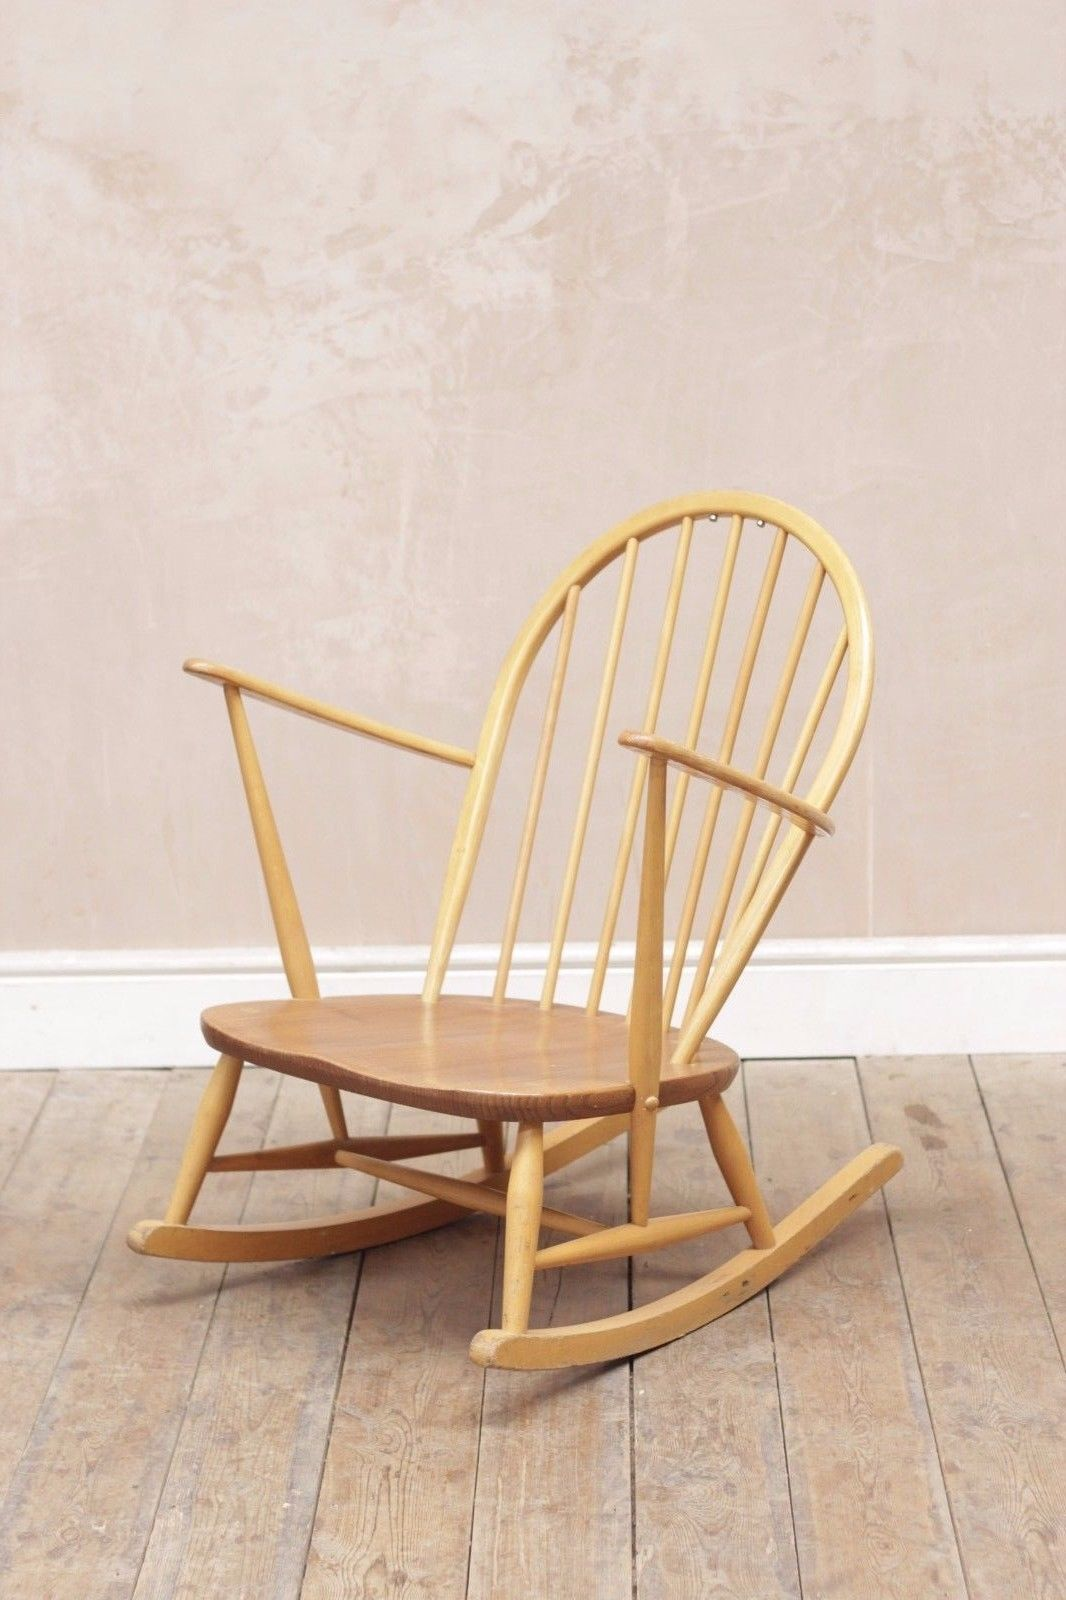 vintage-retro-mid-century-ercol-windsor-blonde-rocking-chair-medium